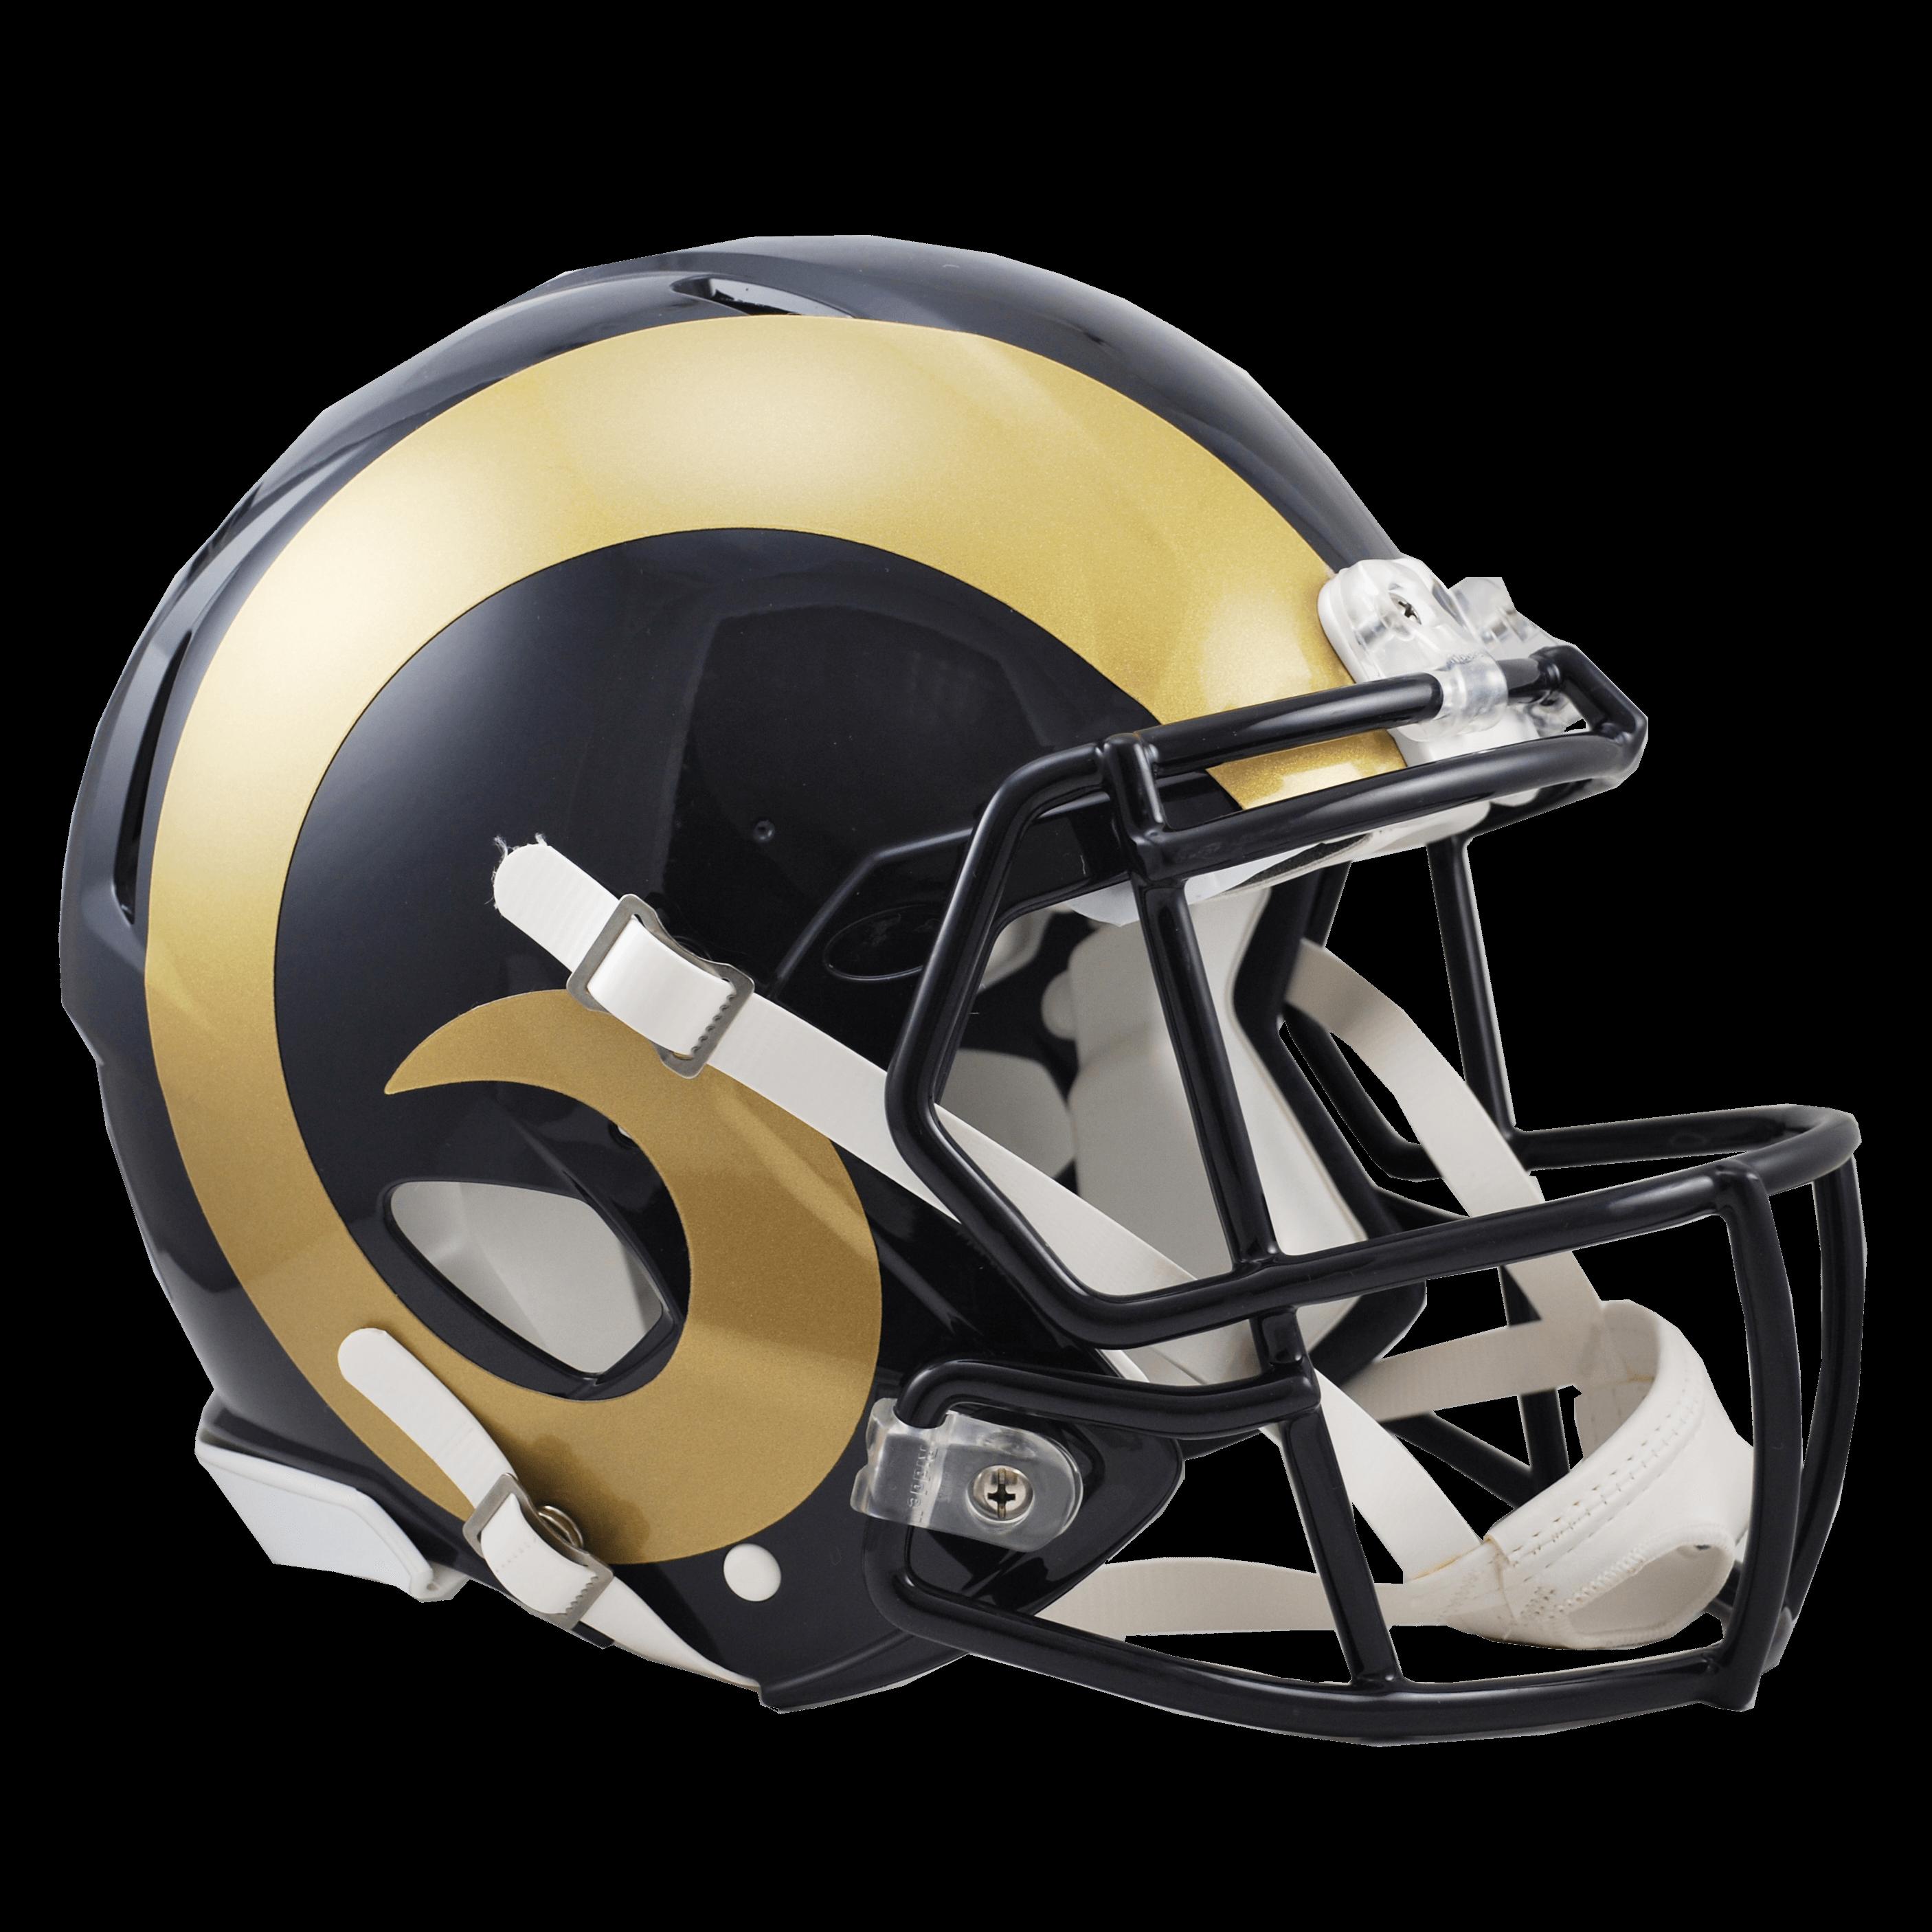 St Louis Rams Helmet Transparent Png Stickpng